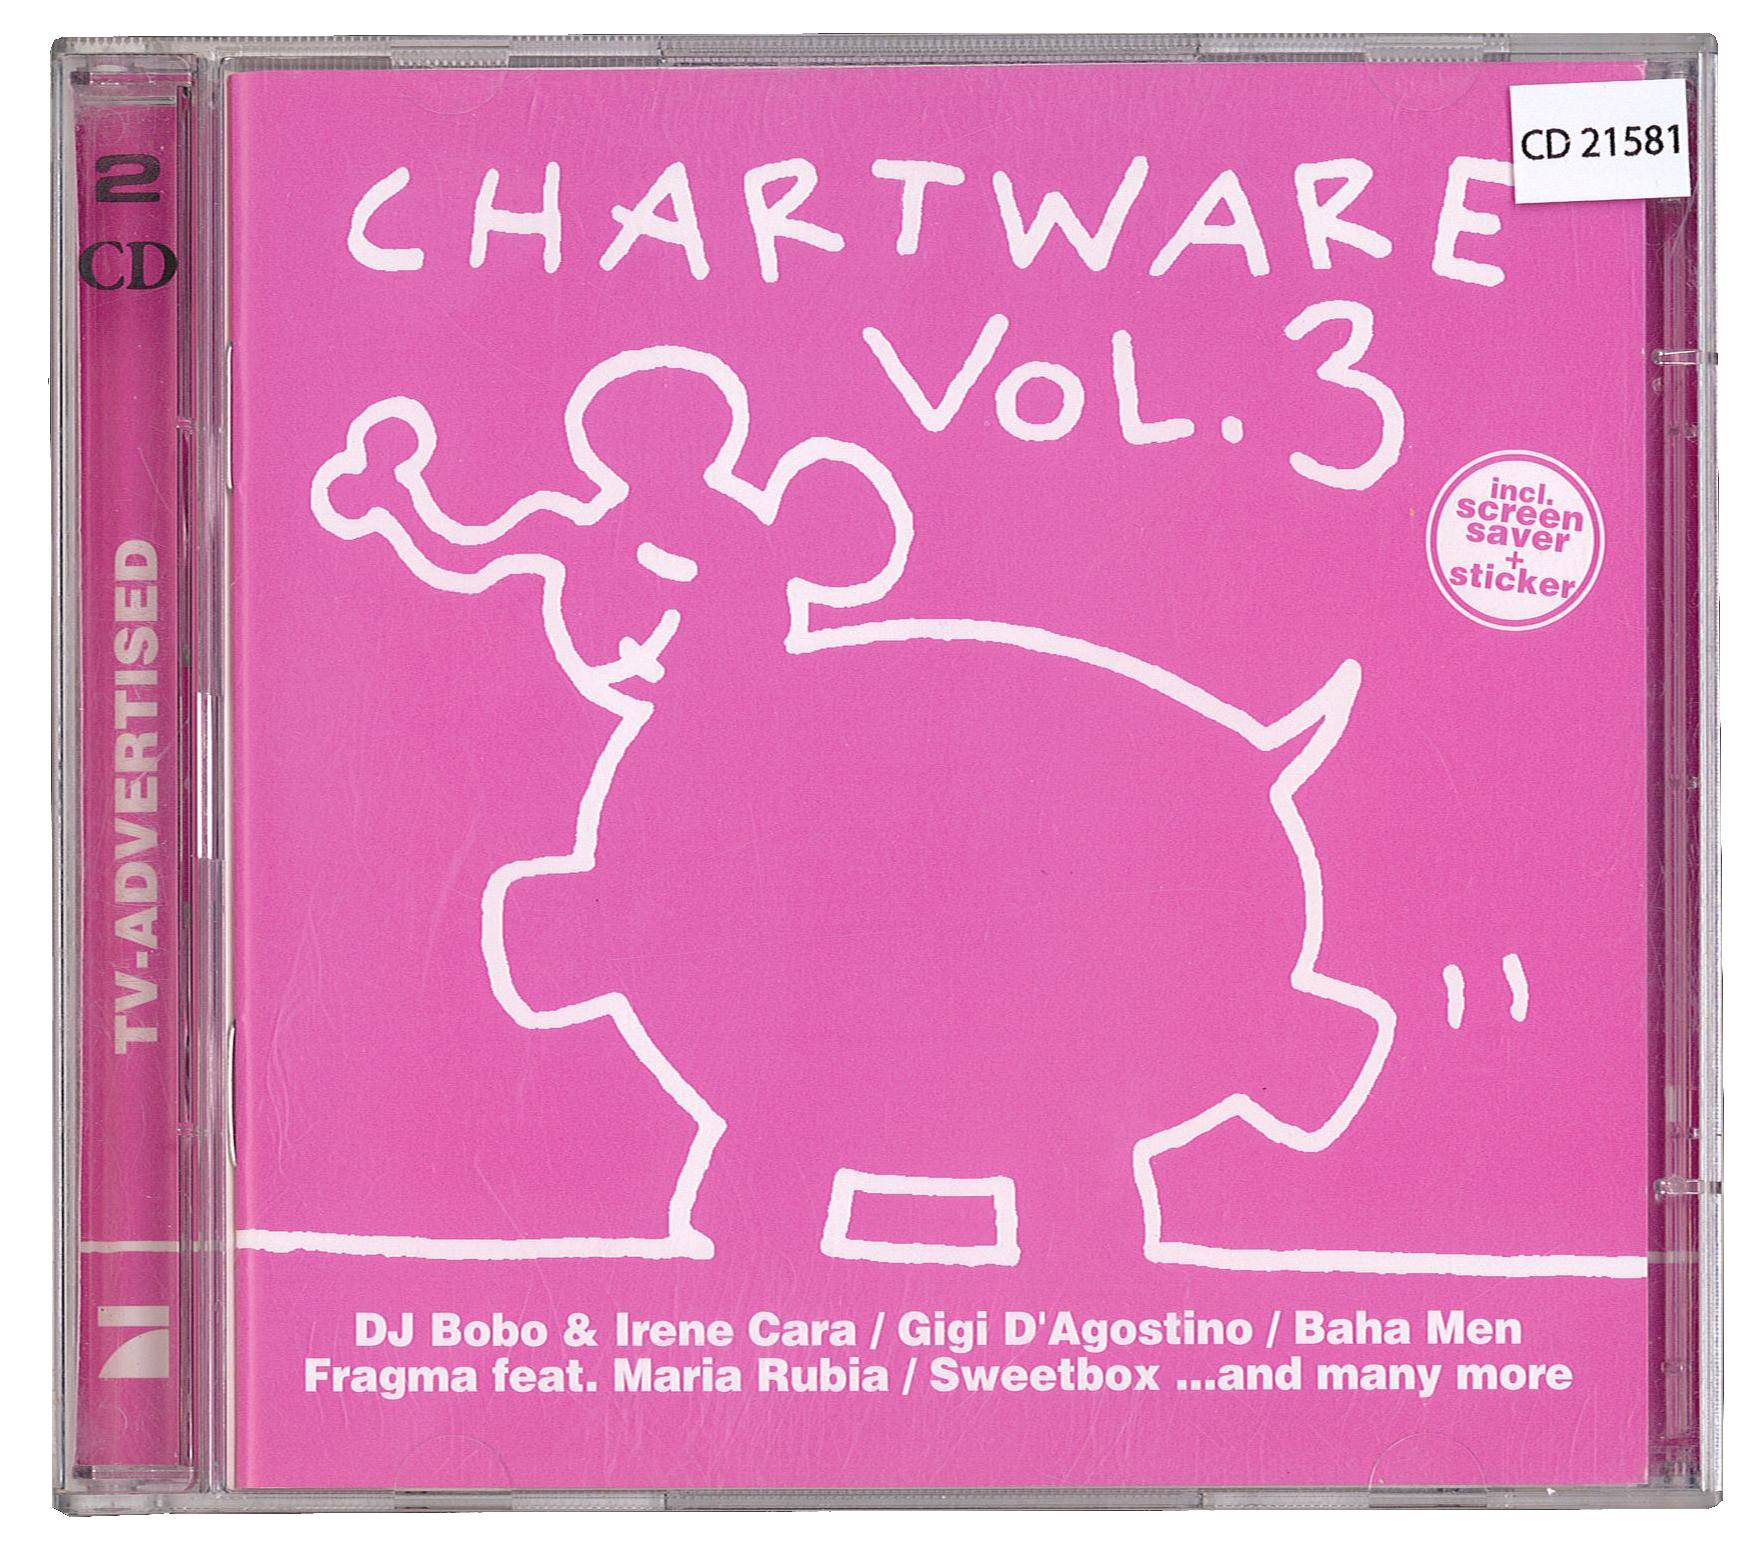 WLWLTDOO-2001-CD-CHARTWARE-VOL_3-FRONT.jpg